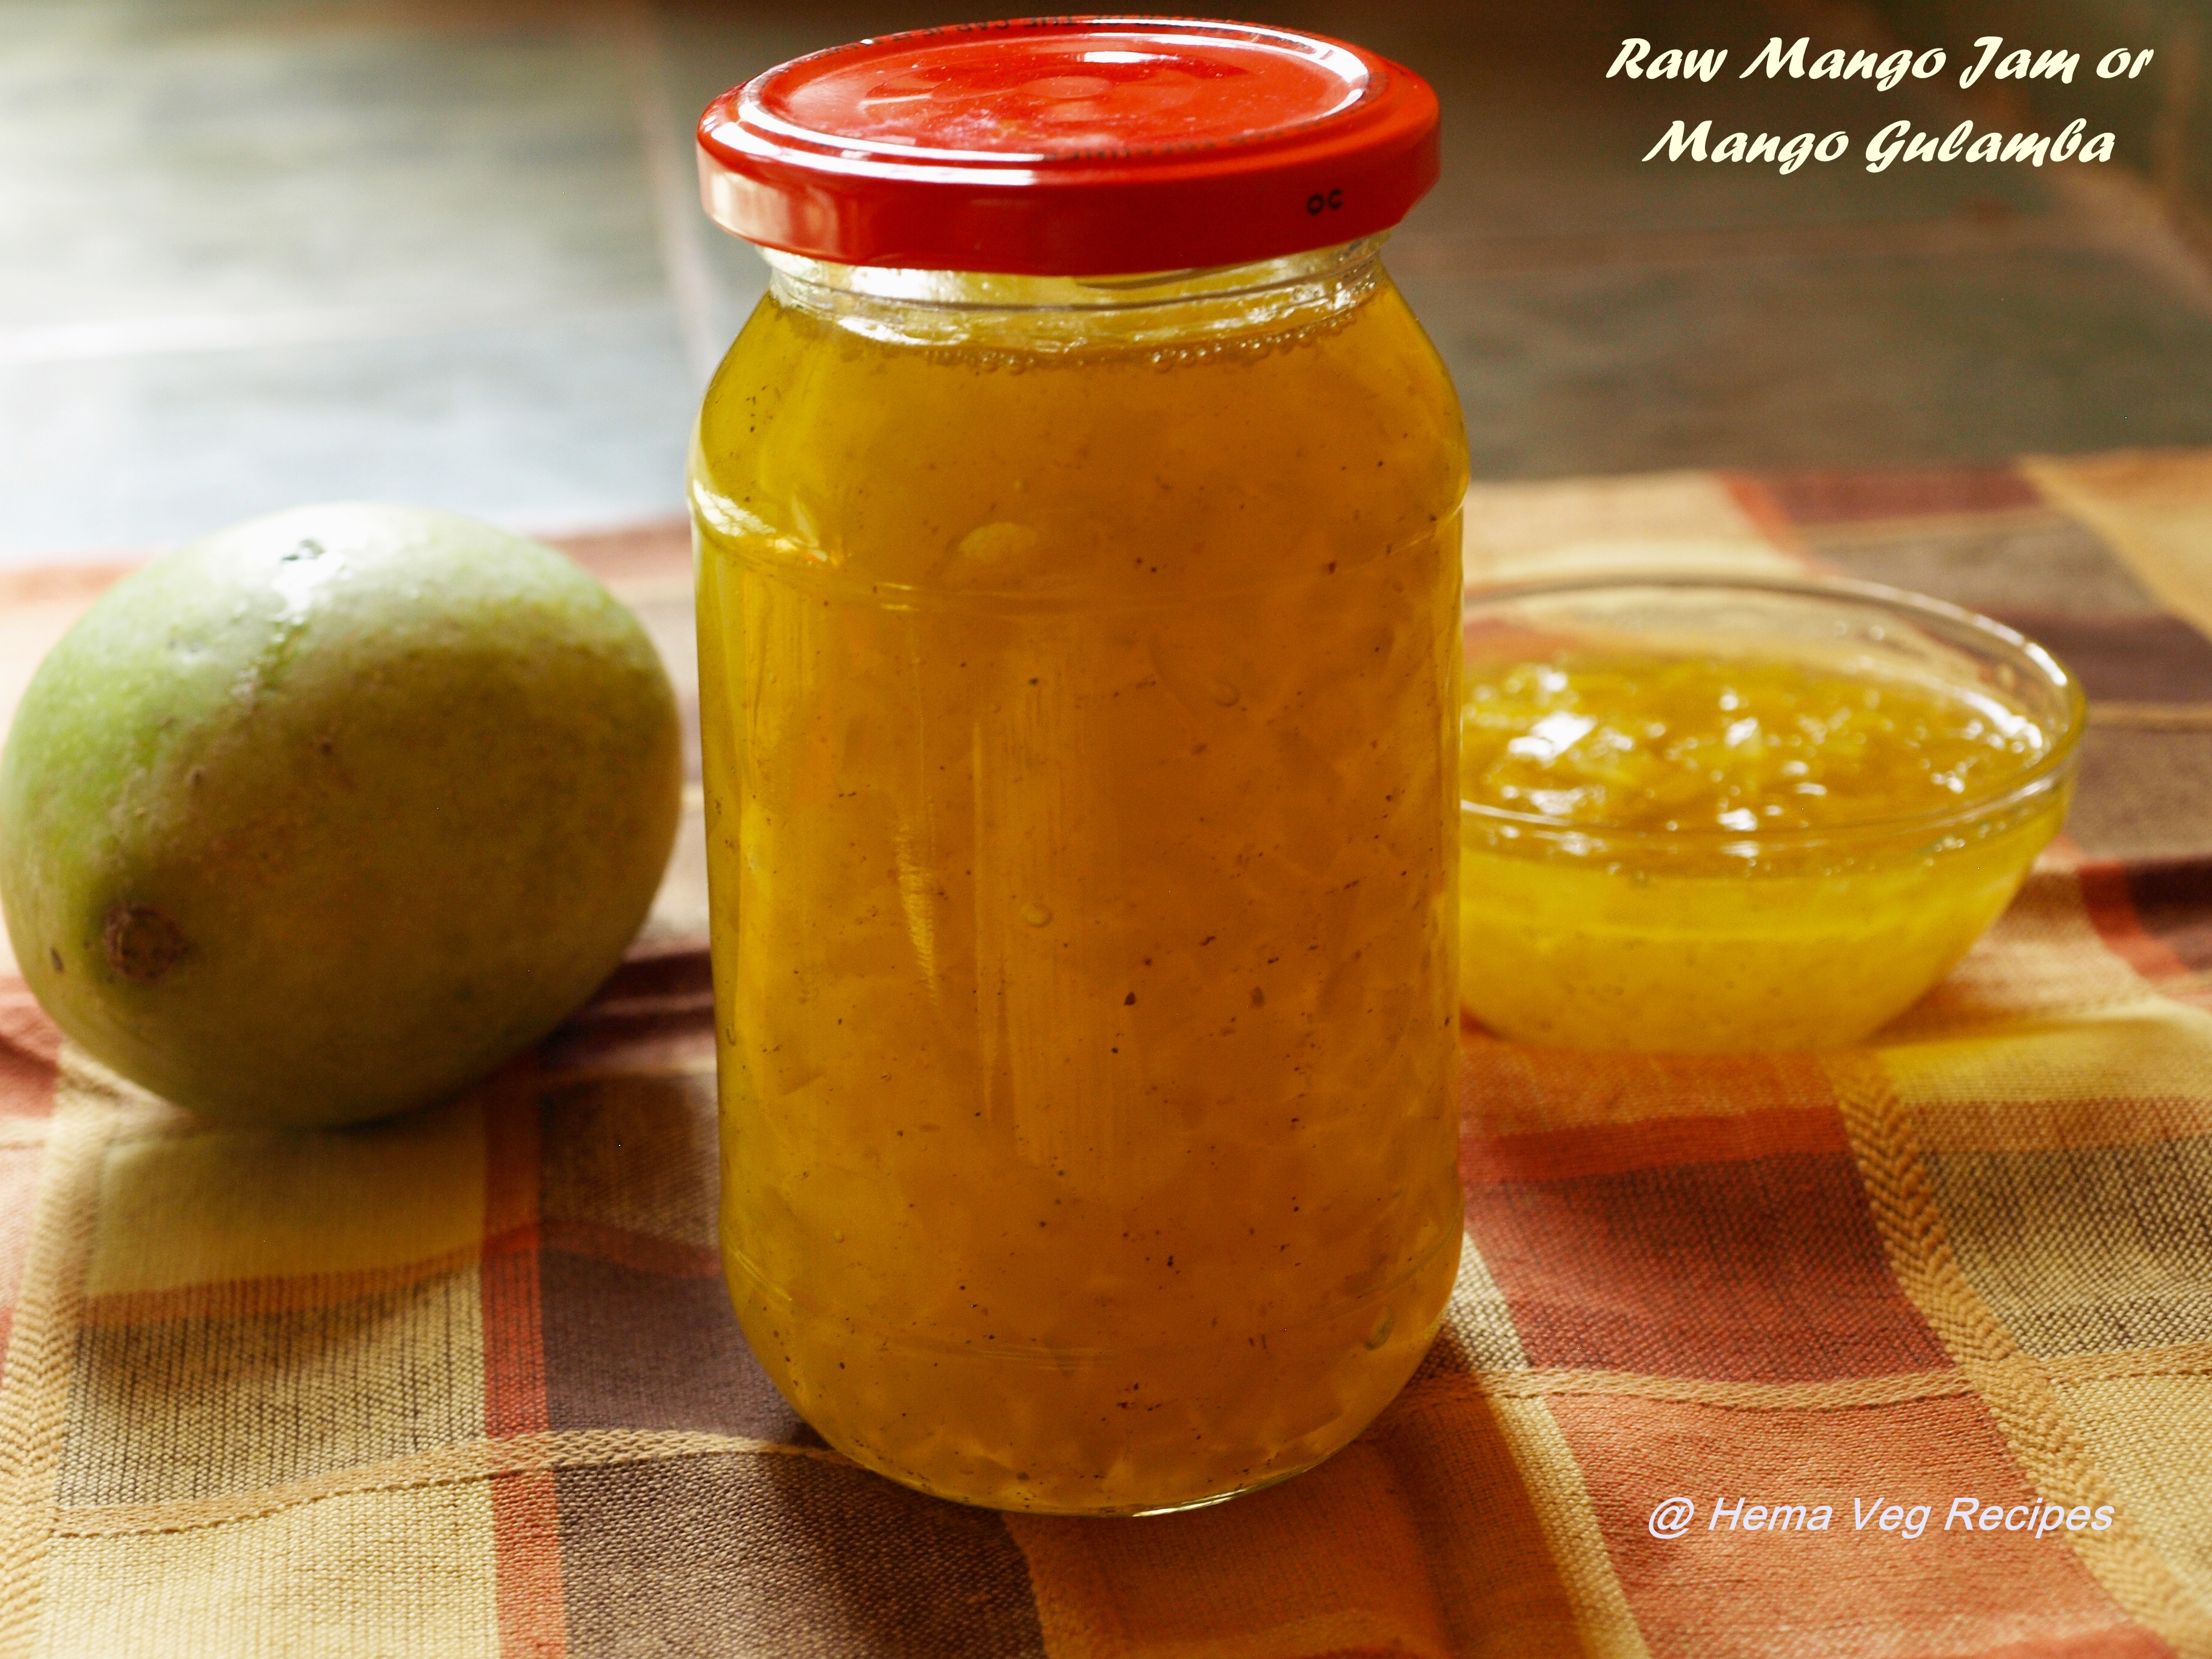 Raw Mango Jam or Mango Gulamba